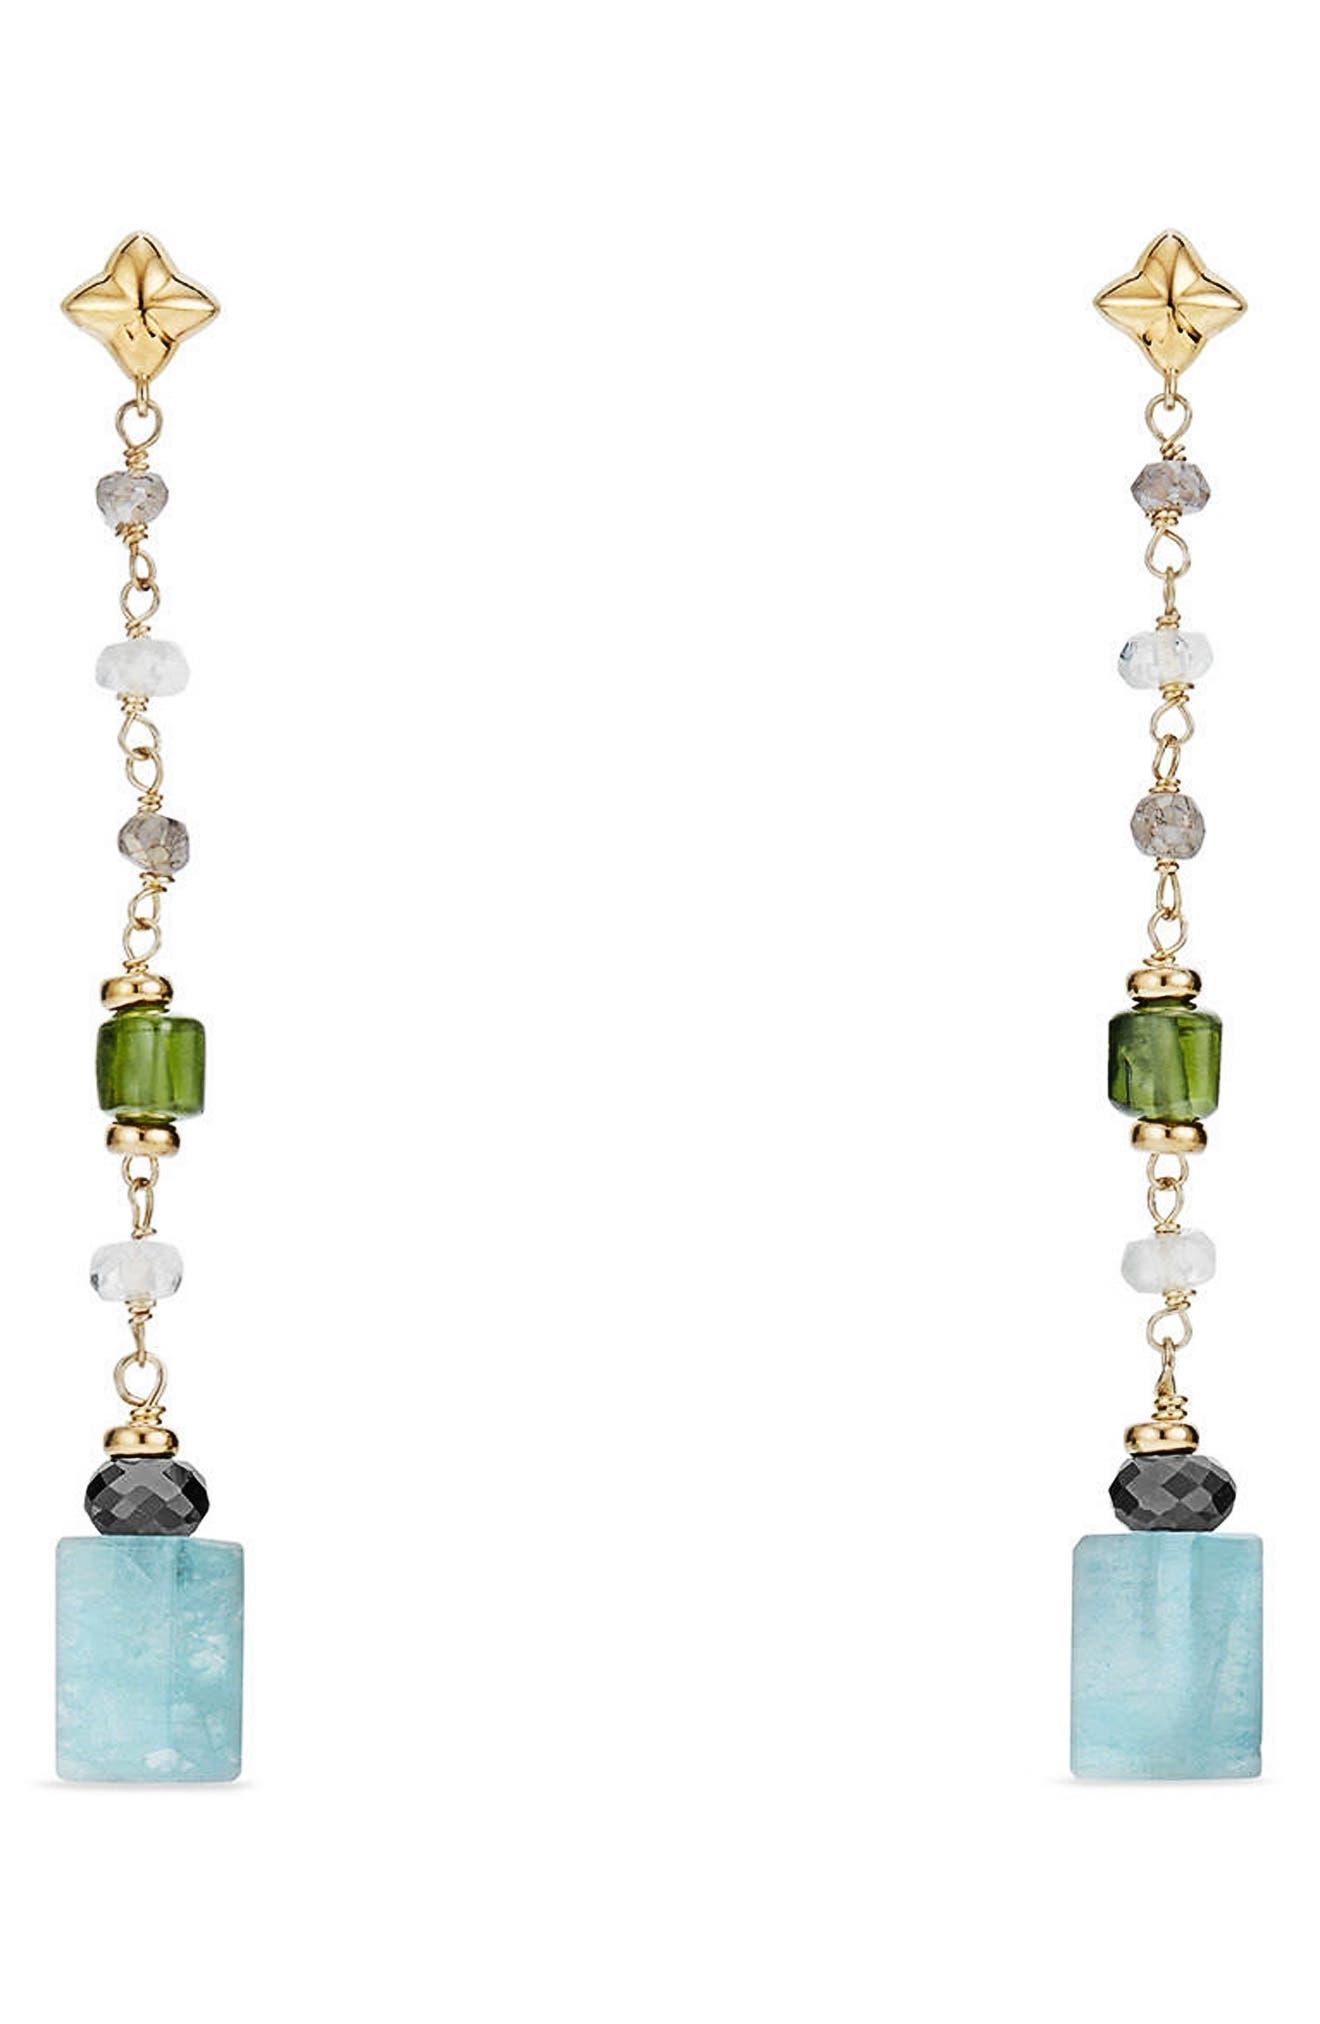 Bead & Chain Earrings with Semiprecious Stones,                             Main thumbnail 1, color,                             440